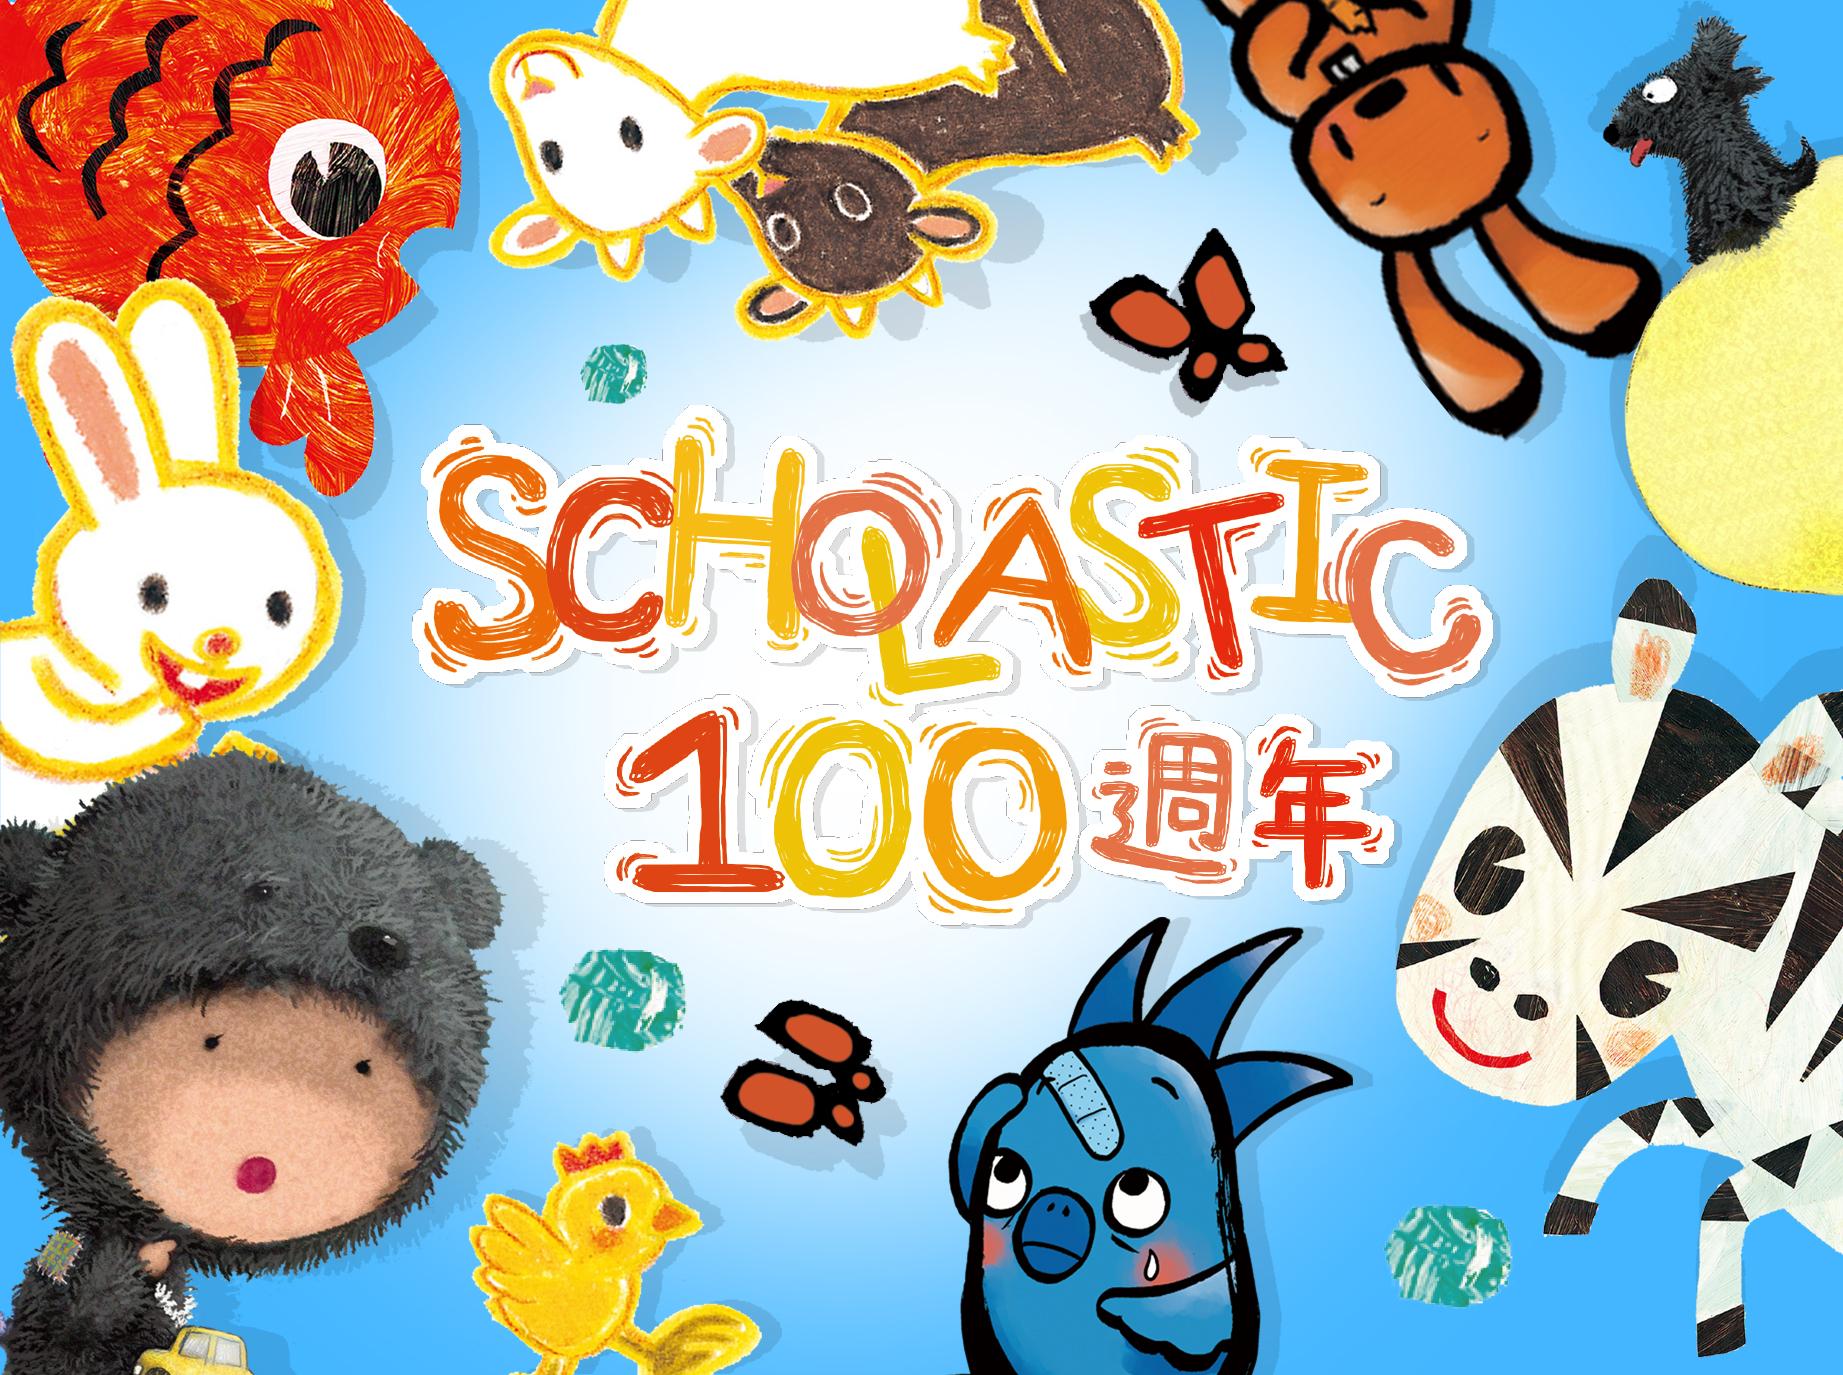 Scholastic100週年特展